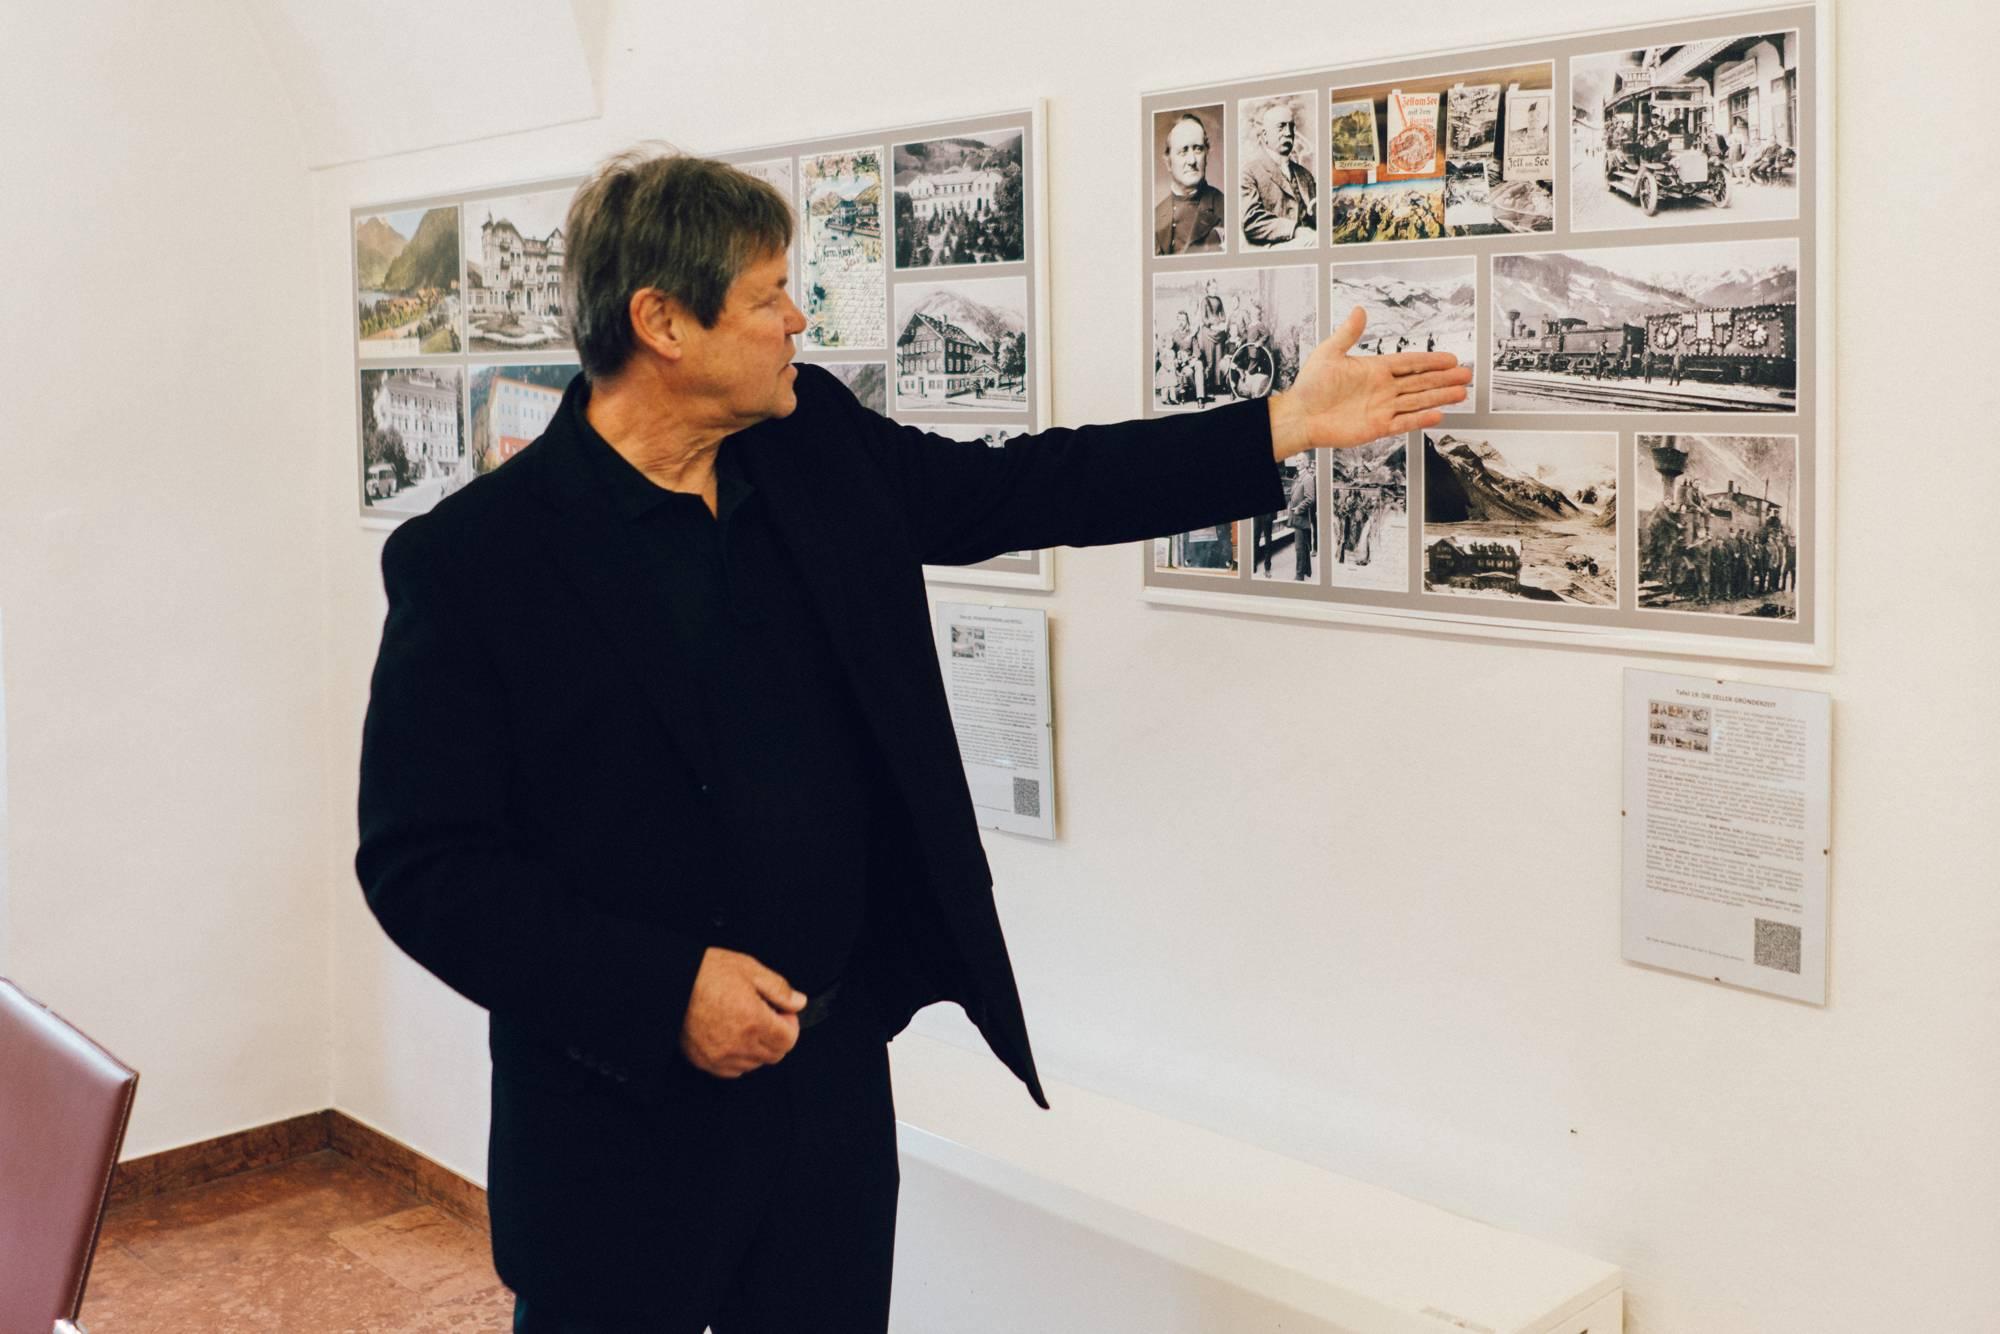 Historian Rainer Hochhold